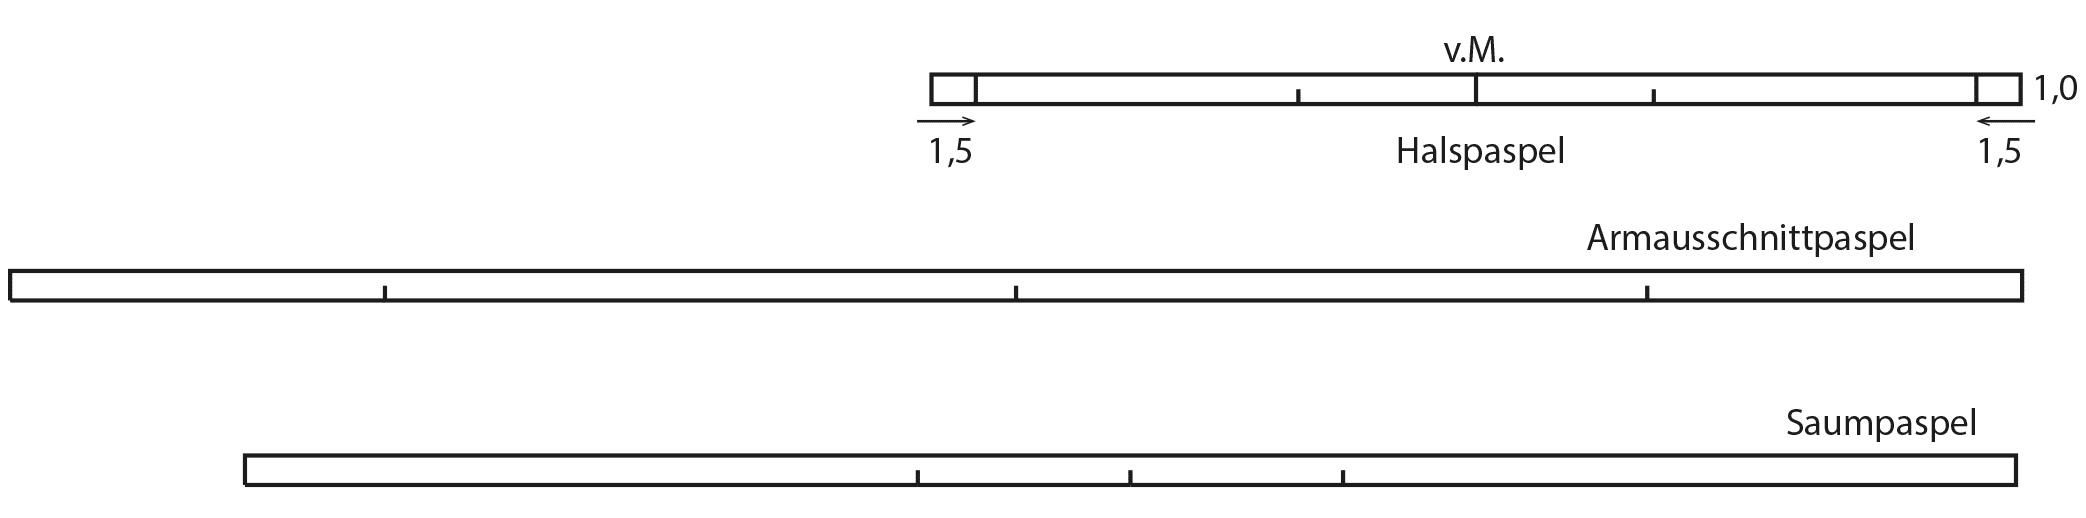 Die Halspaspel, Armausschnittpaspel und Saumpaspel sind abgebildet.